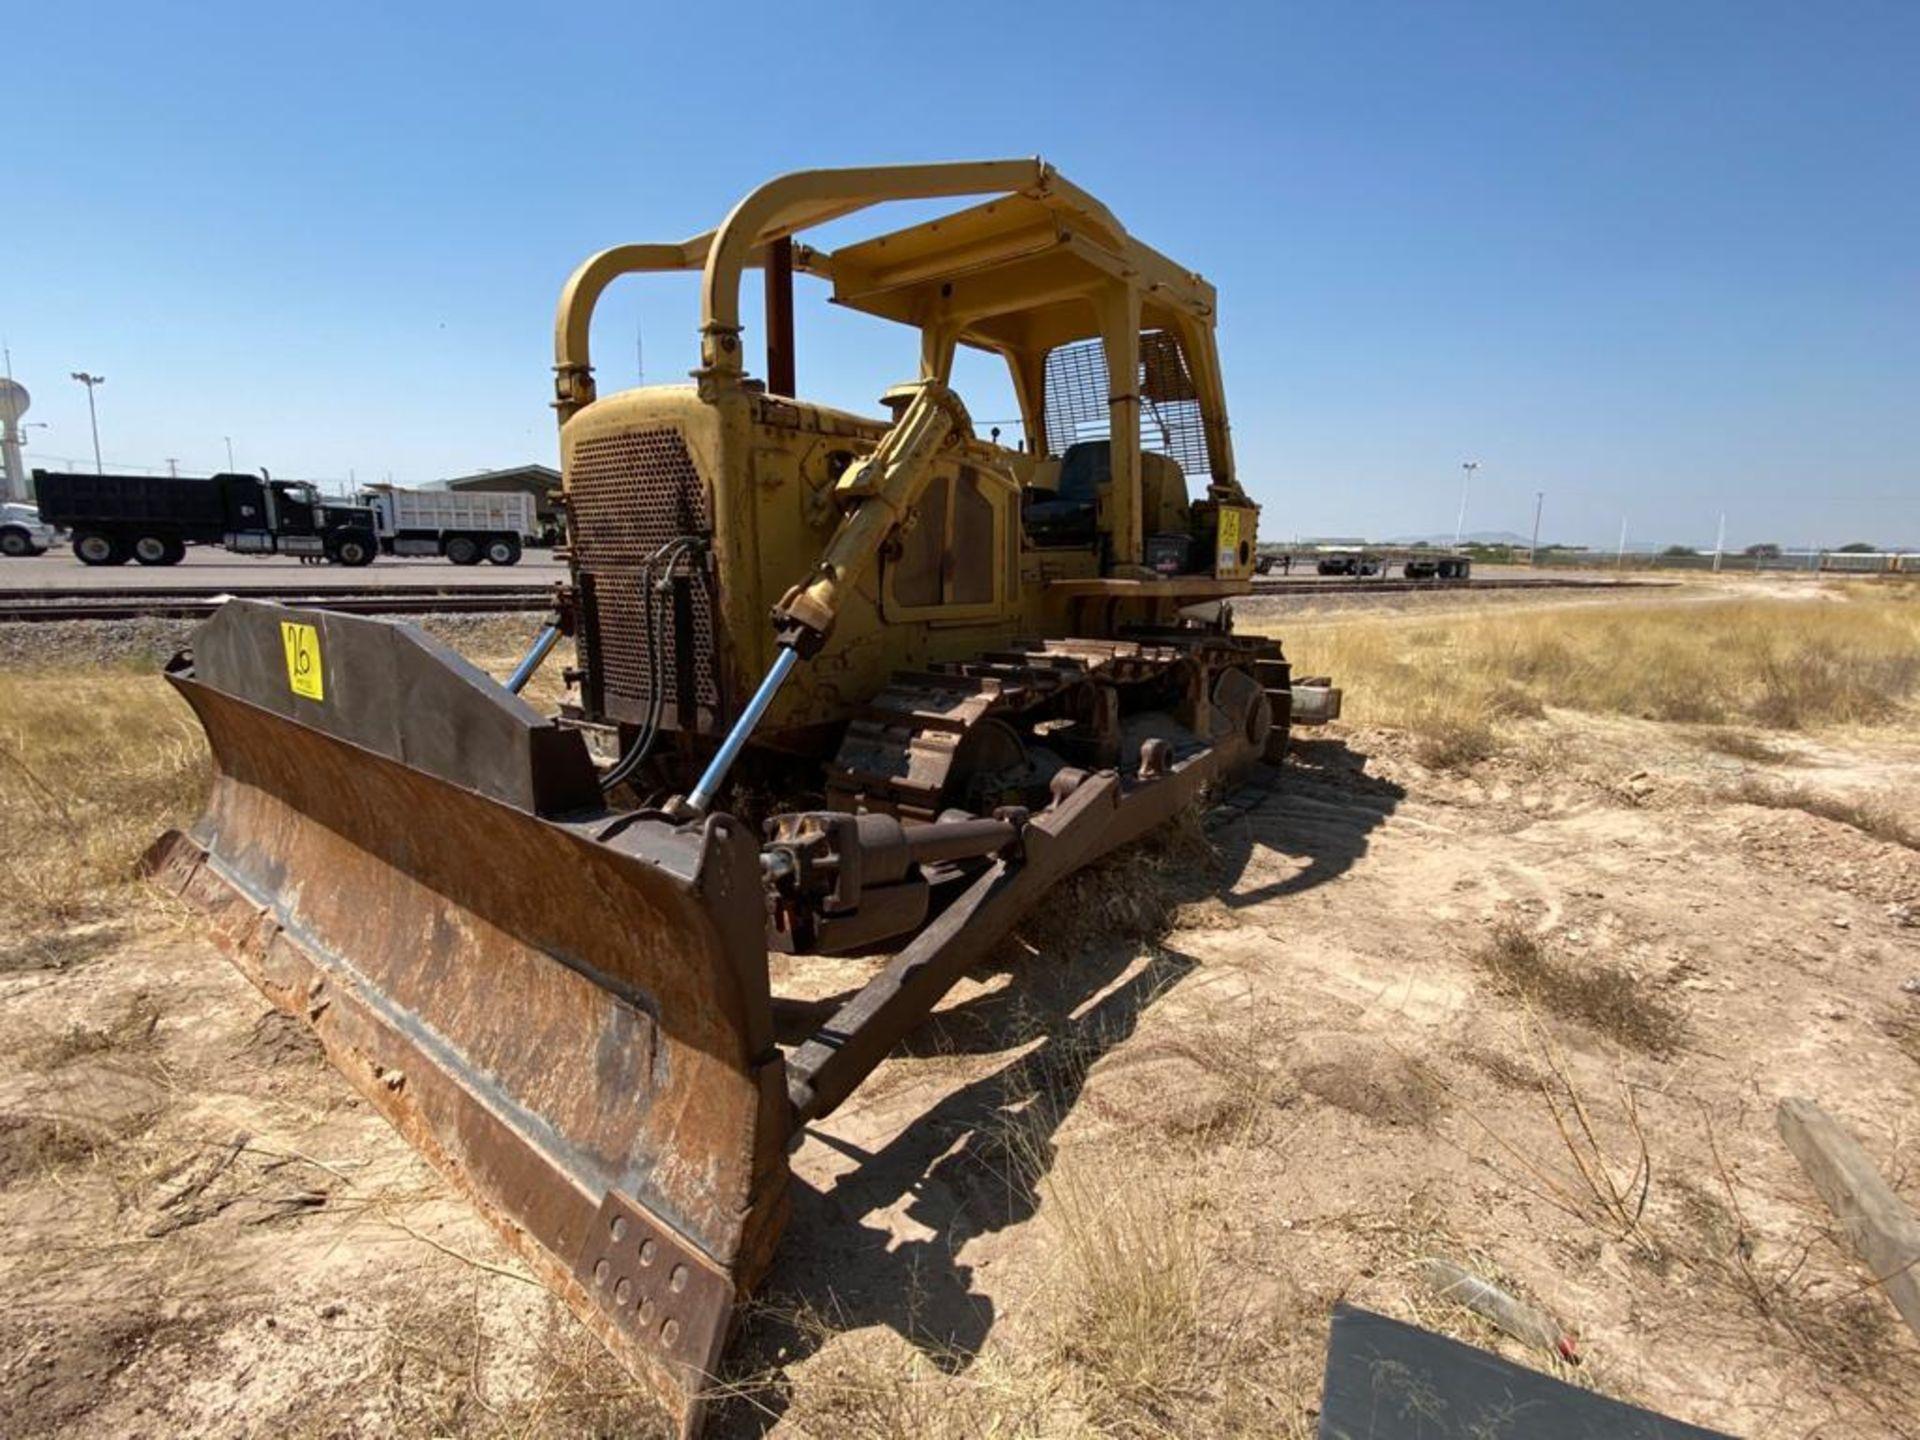 Caterpillar D7G Bulldozer, Serial number 92V5897, Diesel motor - Image 7 of 48